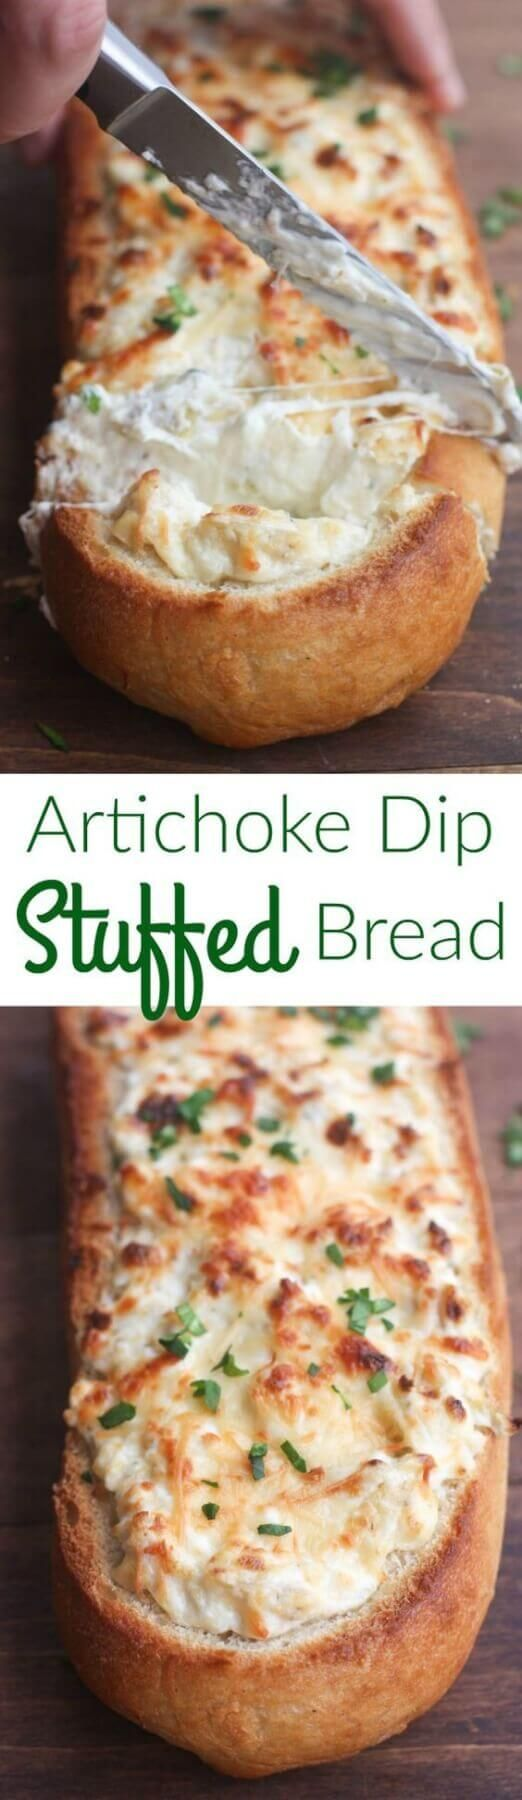 Quick & Easy Artichoke Dip Stuffed Bread Recipe